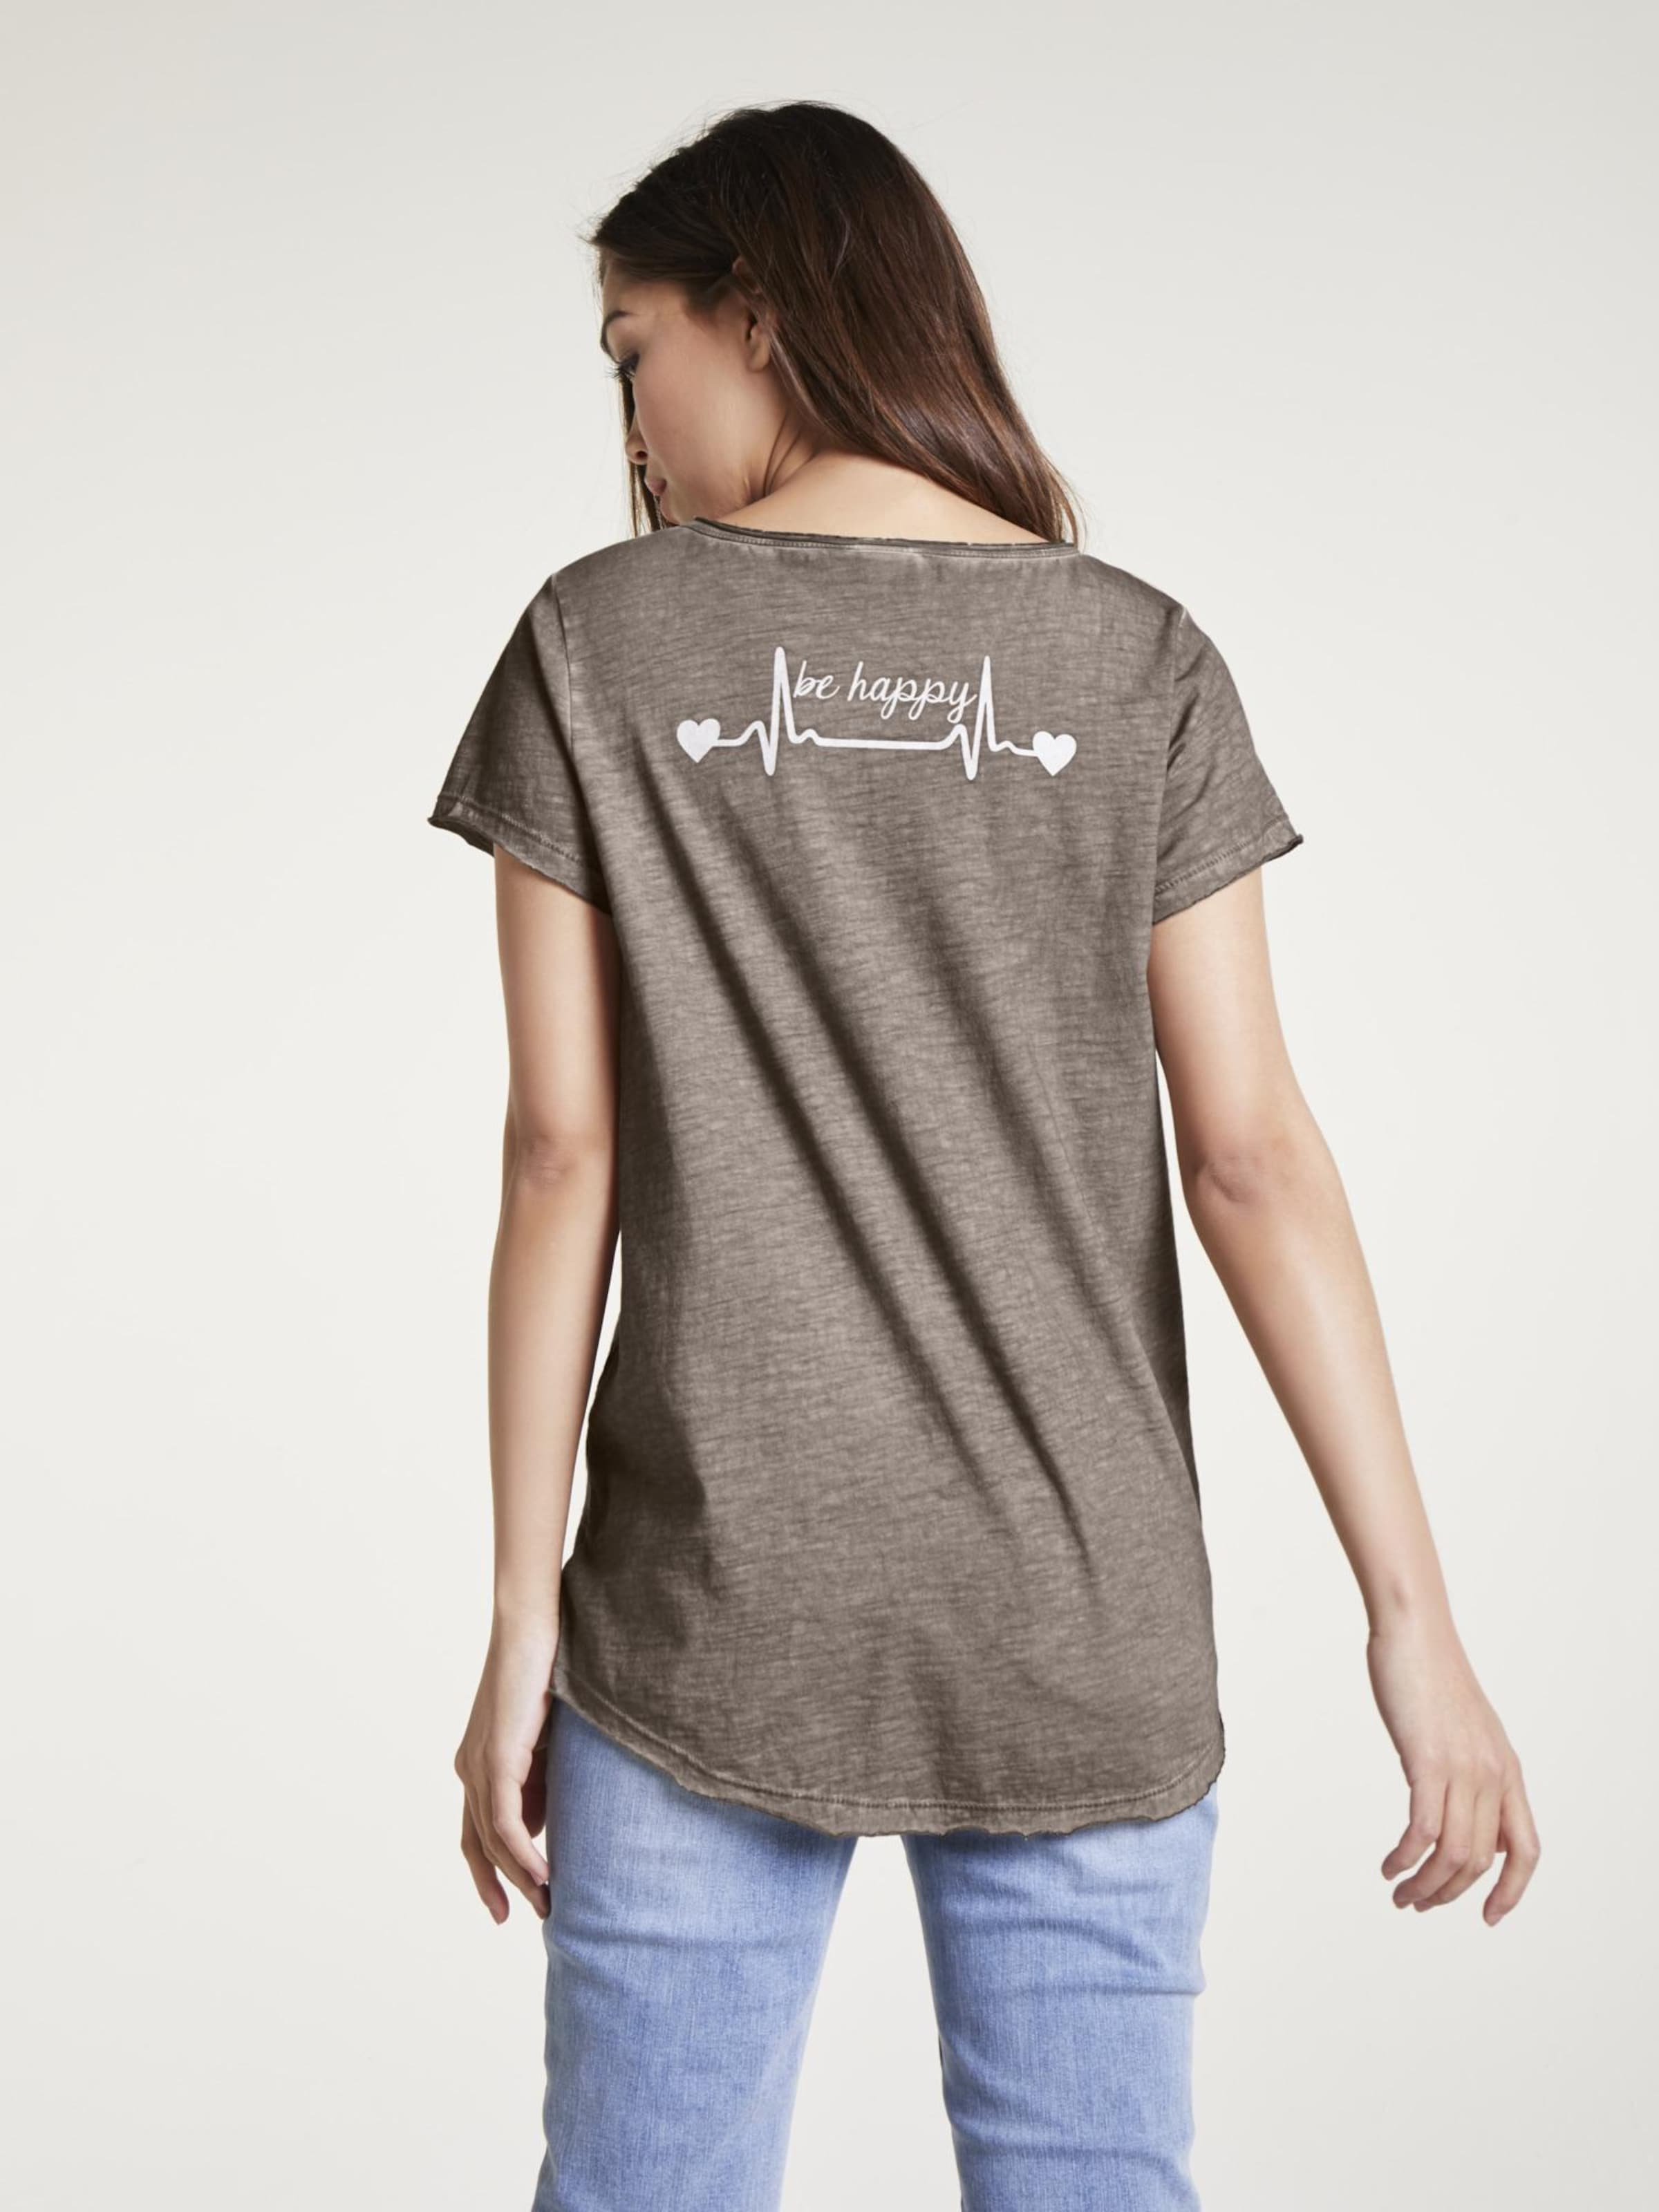 'casual' Shirt Heine In 'casual' Heine In Shirt CamelTaupe CamelTaupe kTwZiulOPX